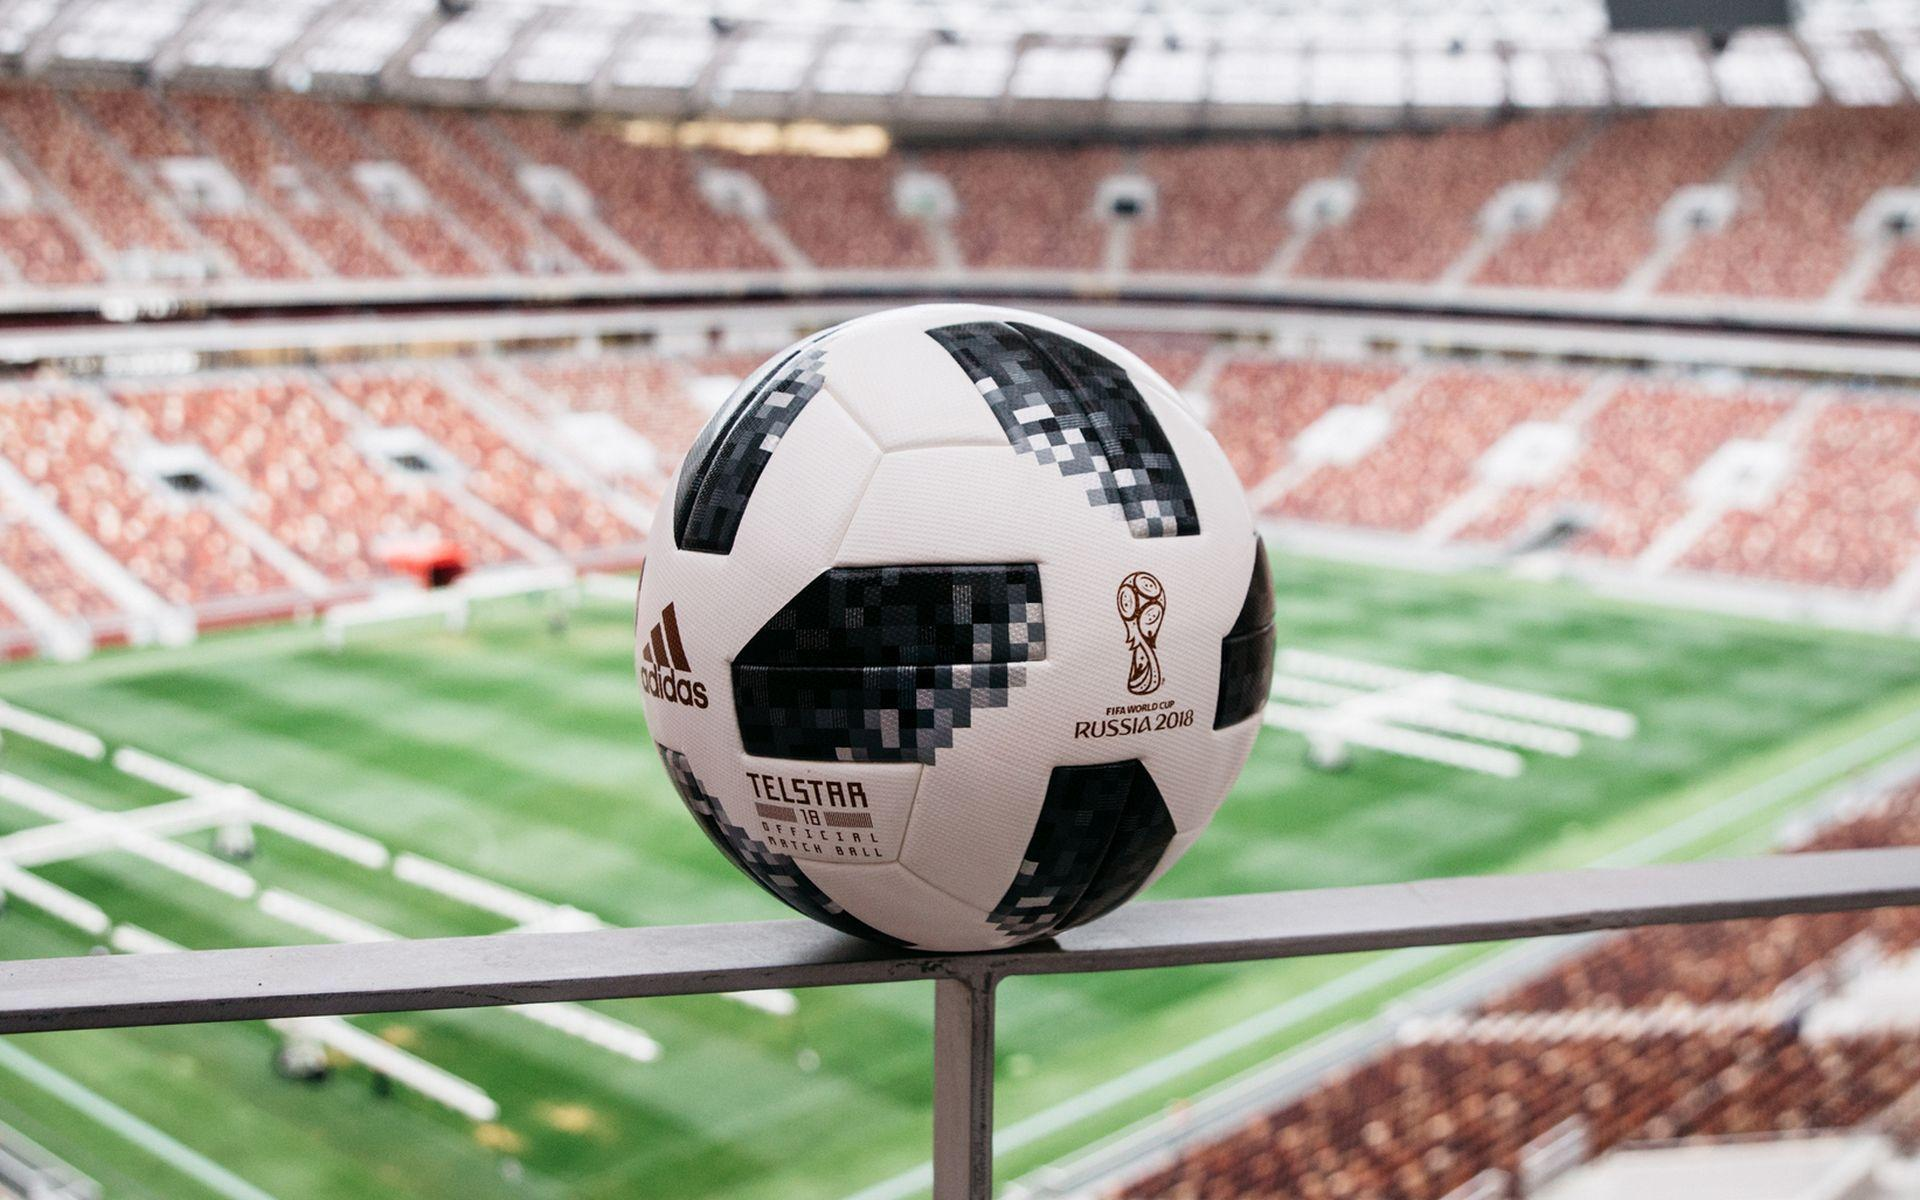 Adidas Telstar 18 FIFA World Cup Wallpapers - Wallpaper Cave 807bdc01dd14d